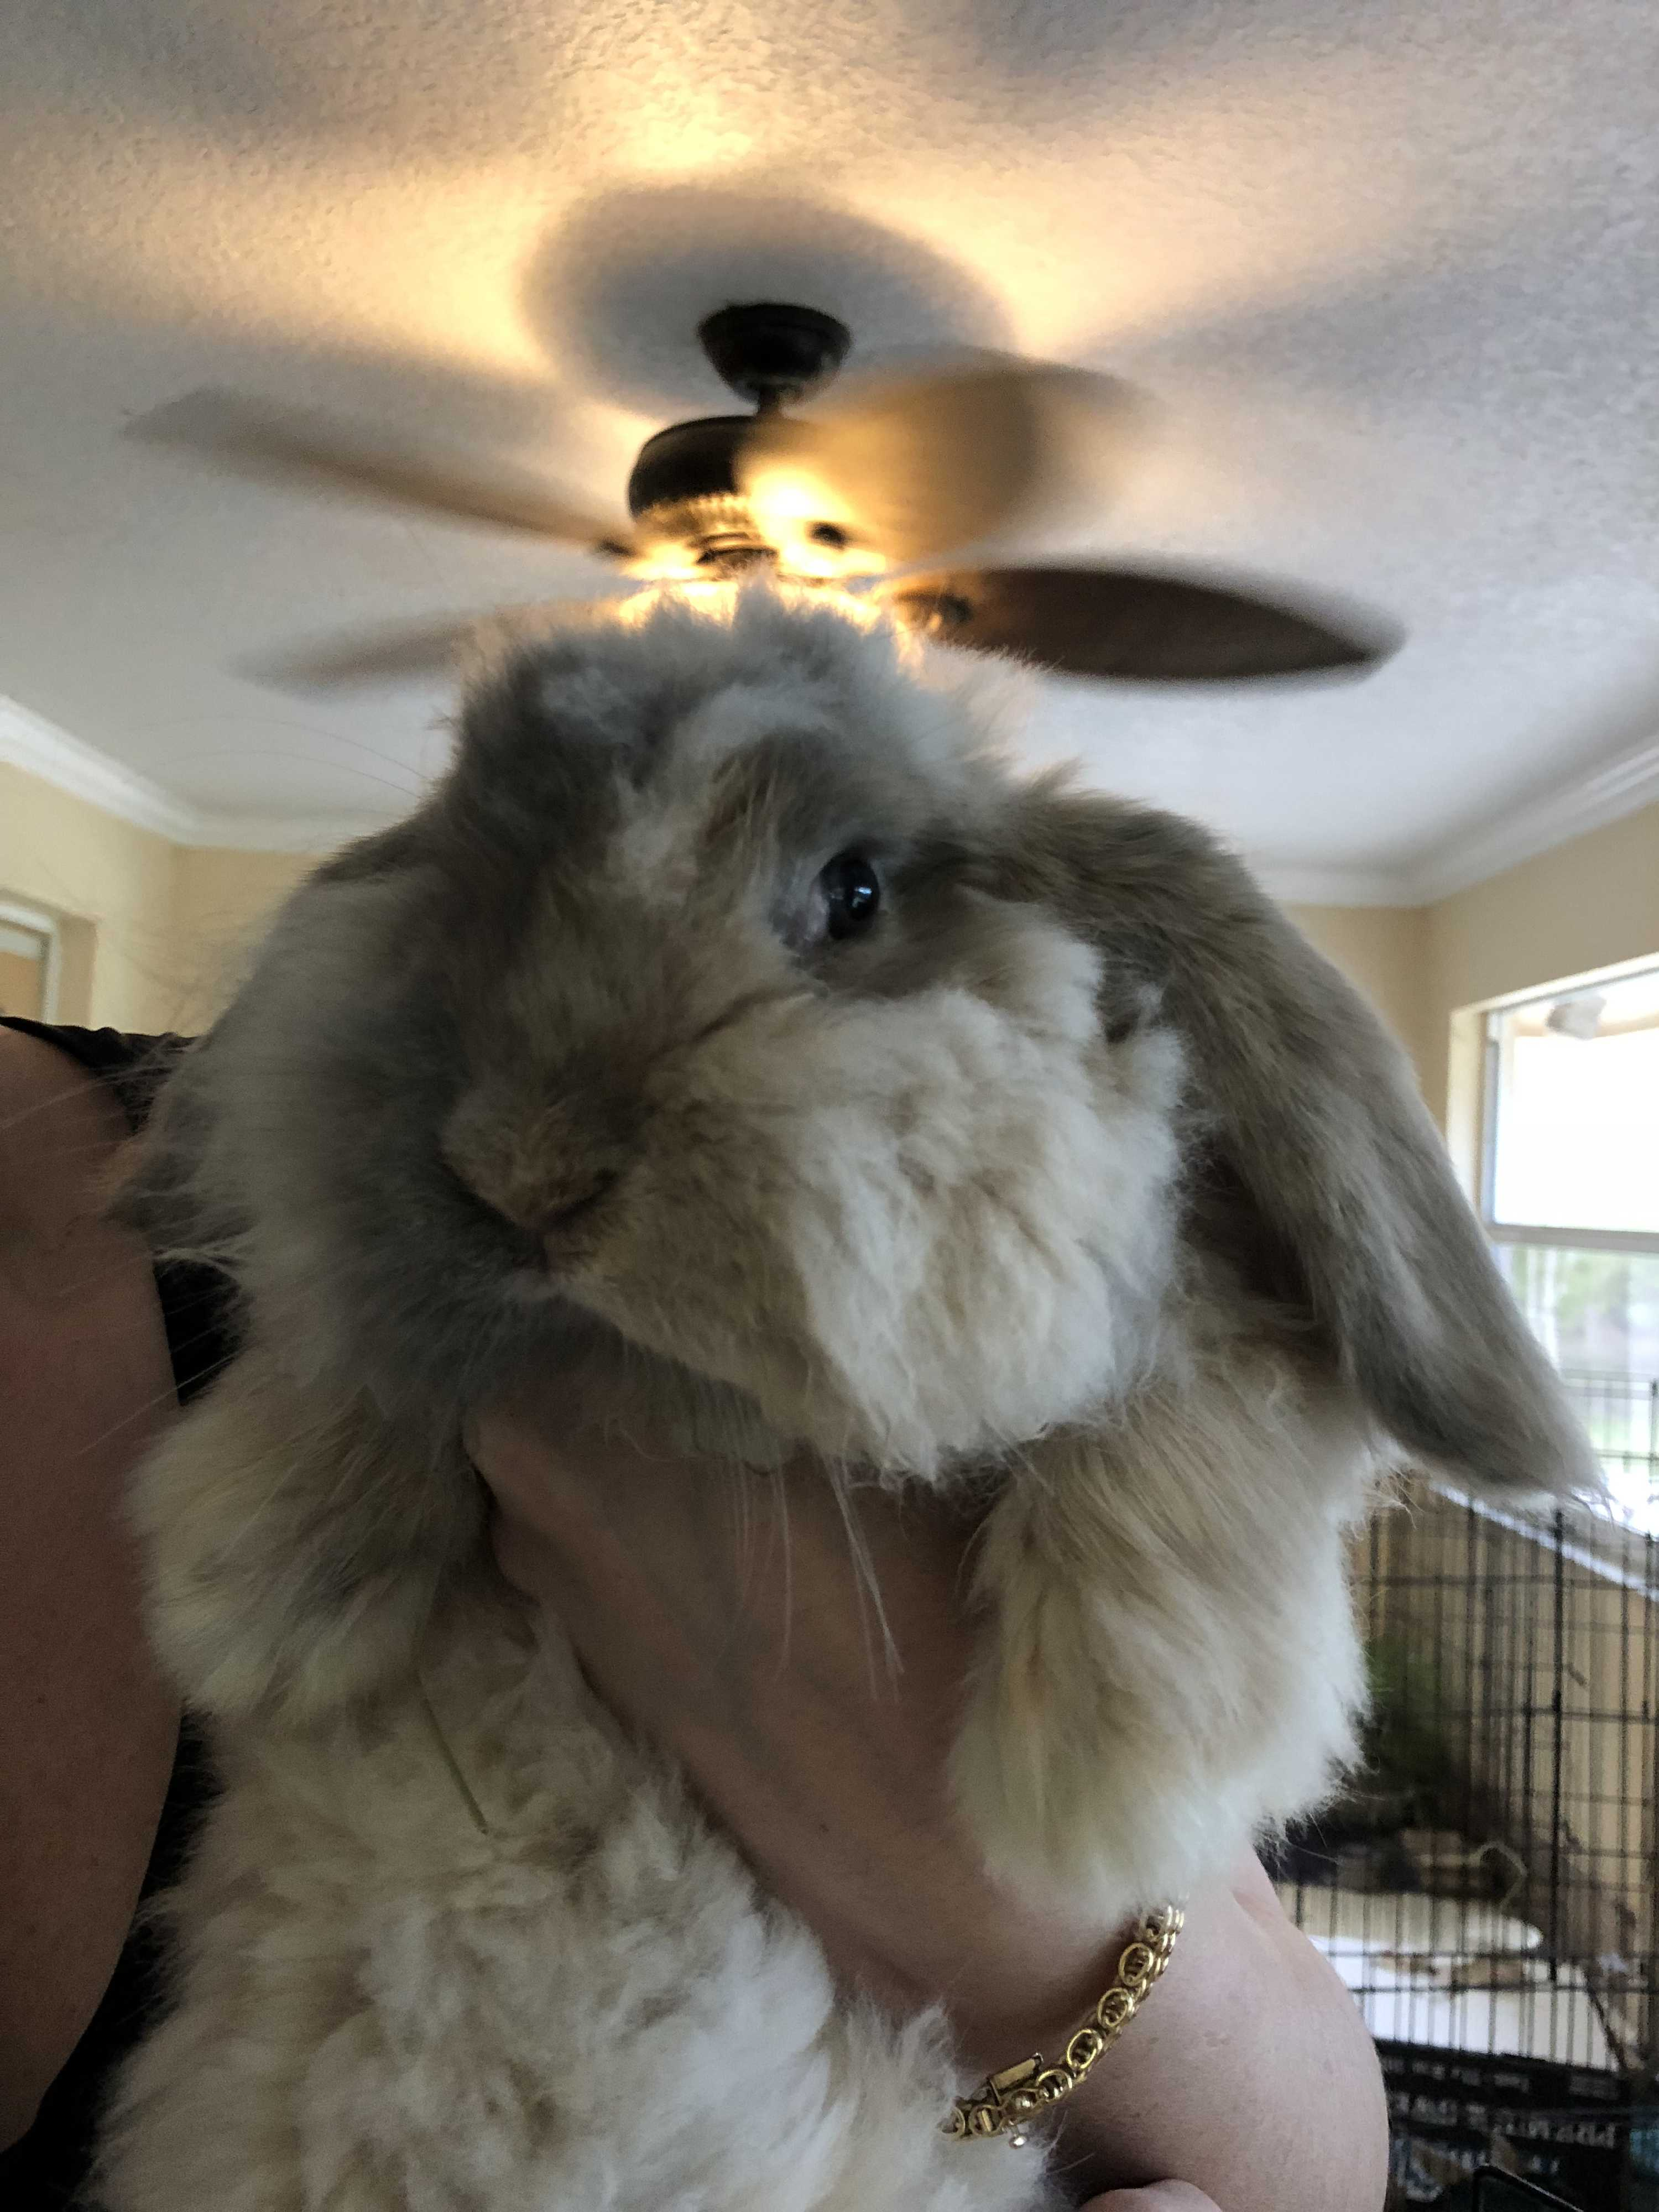 West Palm Beach Fl American Fuzzy Lop Meet Fluffy A Pet